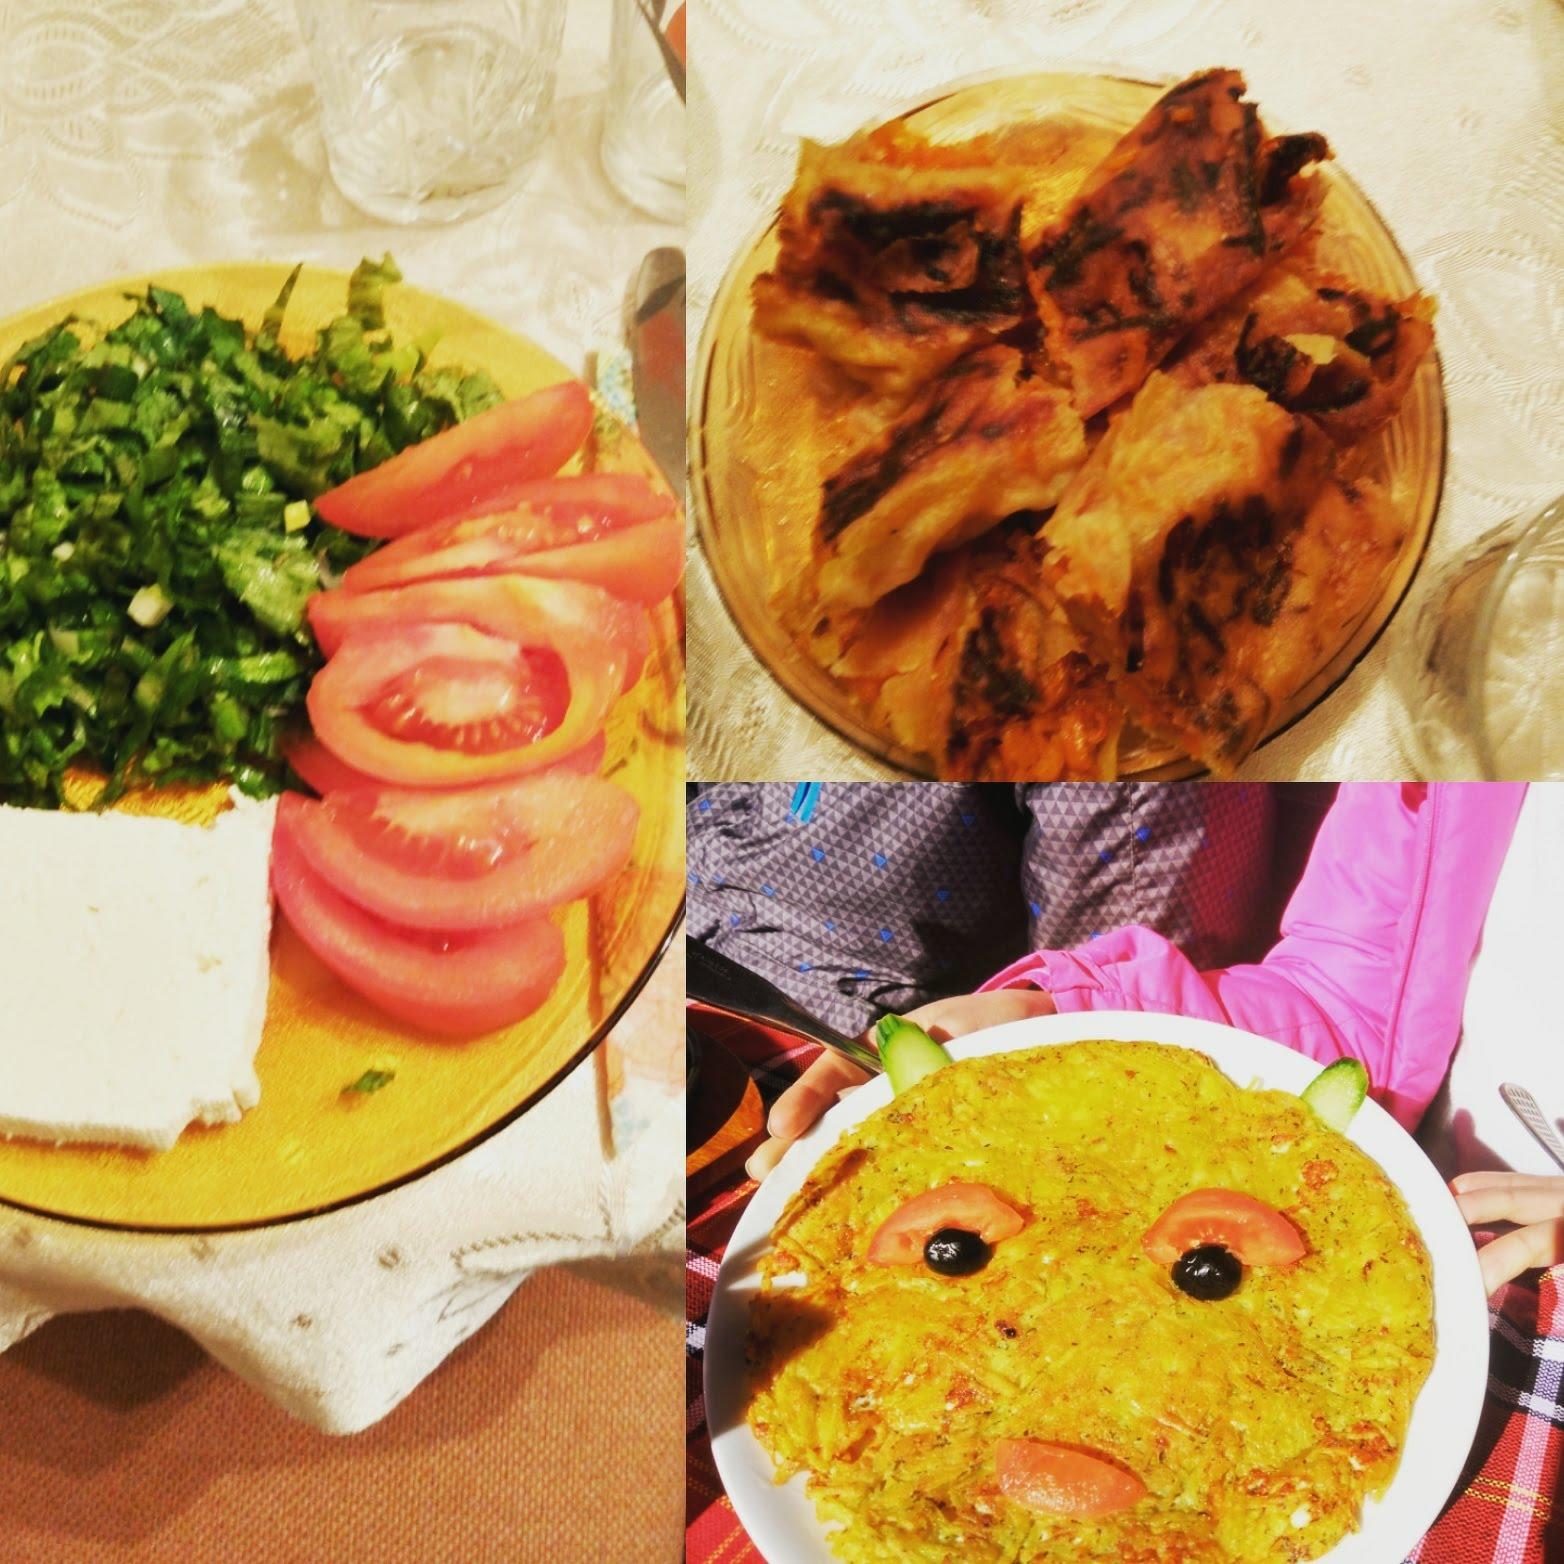 #traditional #bulgarian #food #rodopi #mountain #patatnik #пататник #тиквеник #bulgariansalad #salad #mechichal #chepelare